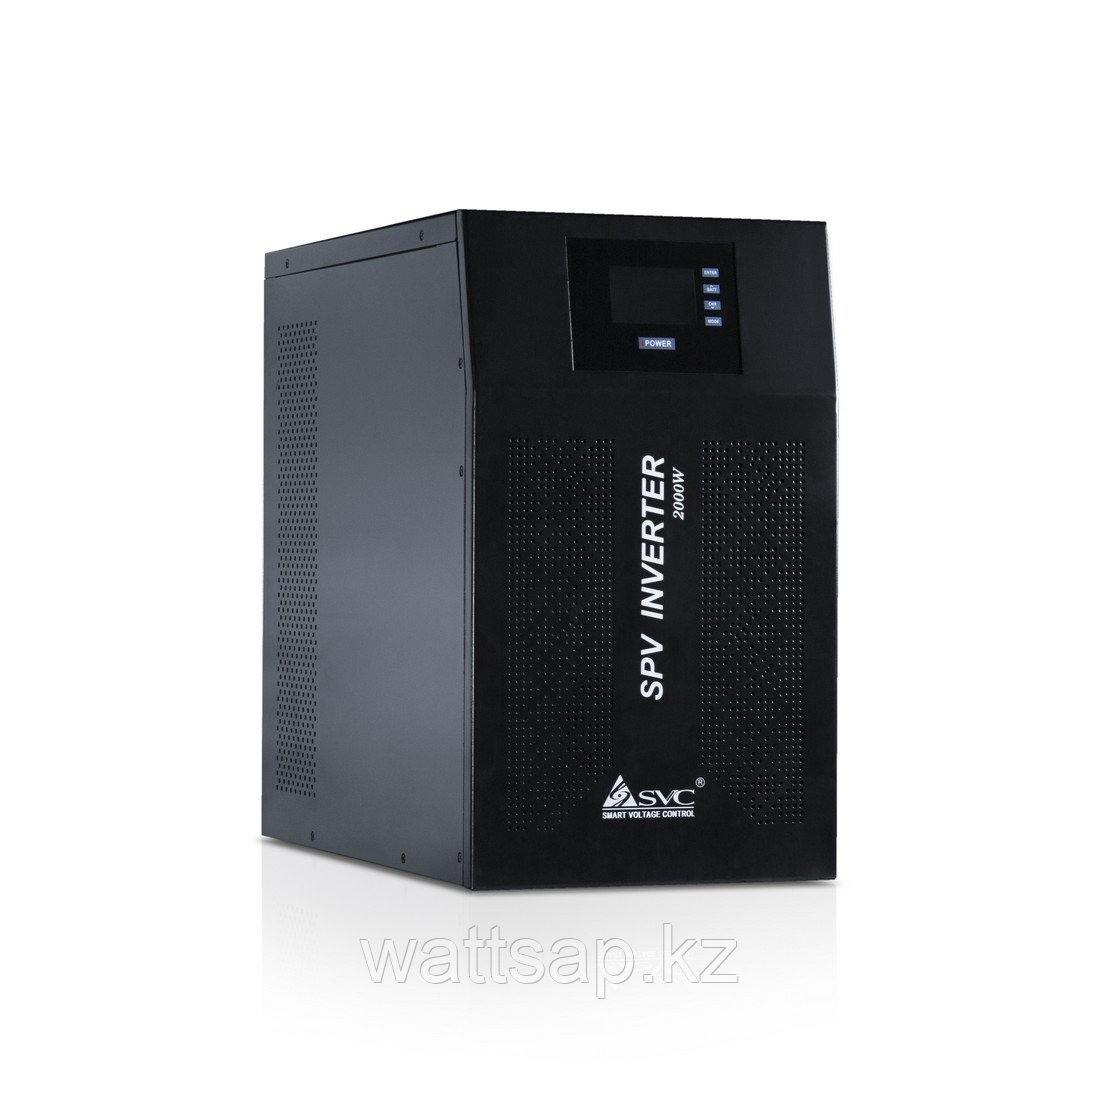 Инвертор, SVC, SPV-L-2000 (2000Вт), Вход 48В и/или 220В, Выход: от сети 220В+-10%, от батареи 220В+-5%, Диапазон работы AVR 145-275В, Контроллер: